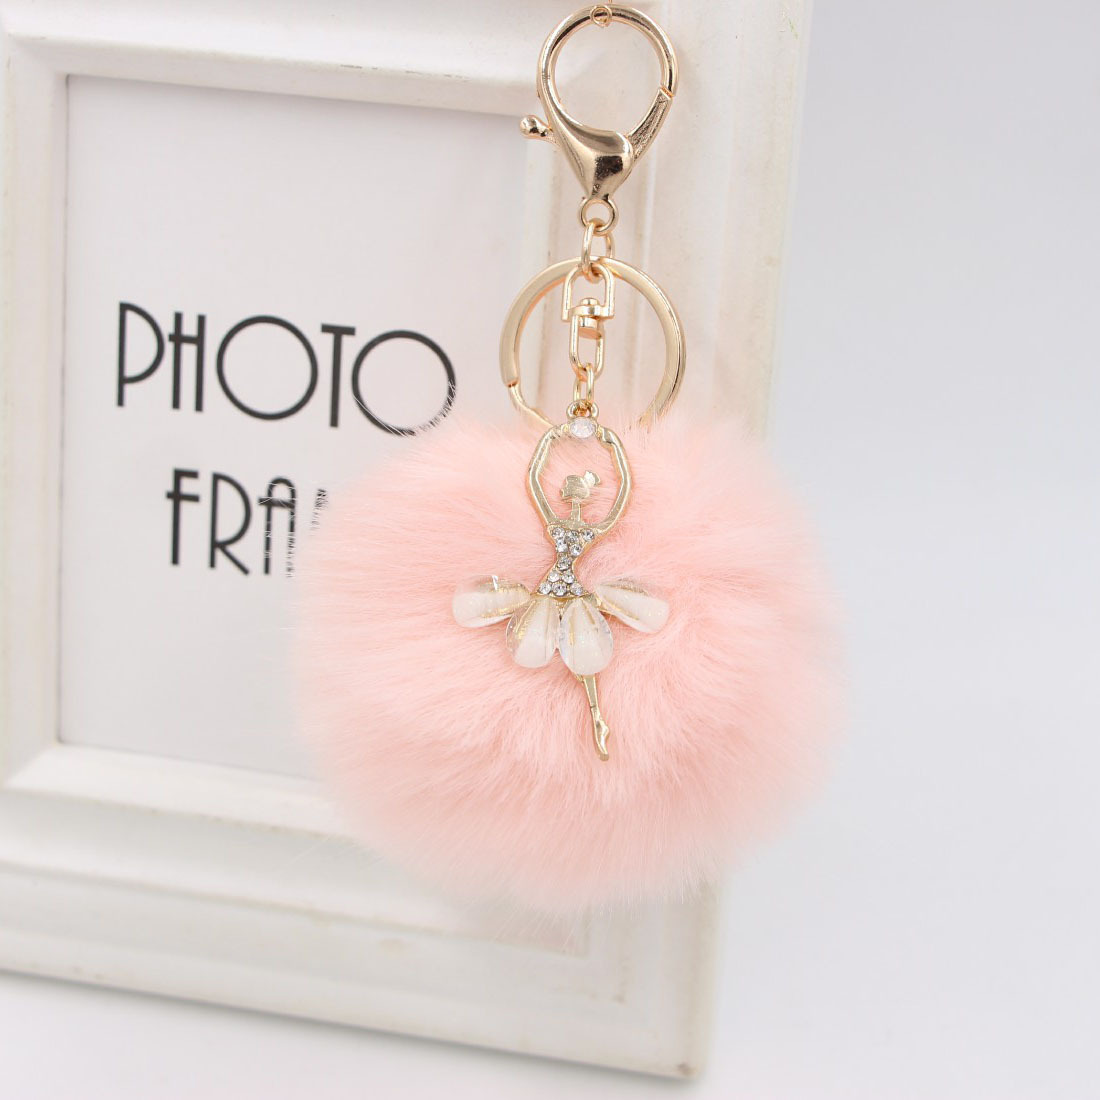 Crystal Ballet Dancing Girl Keyring Pompom Angel Fluffy Plush Pendants Keychains  Car Bag Jewelry Birthdaygifts Valentine's Day